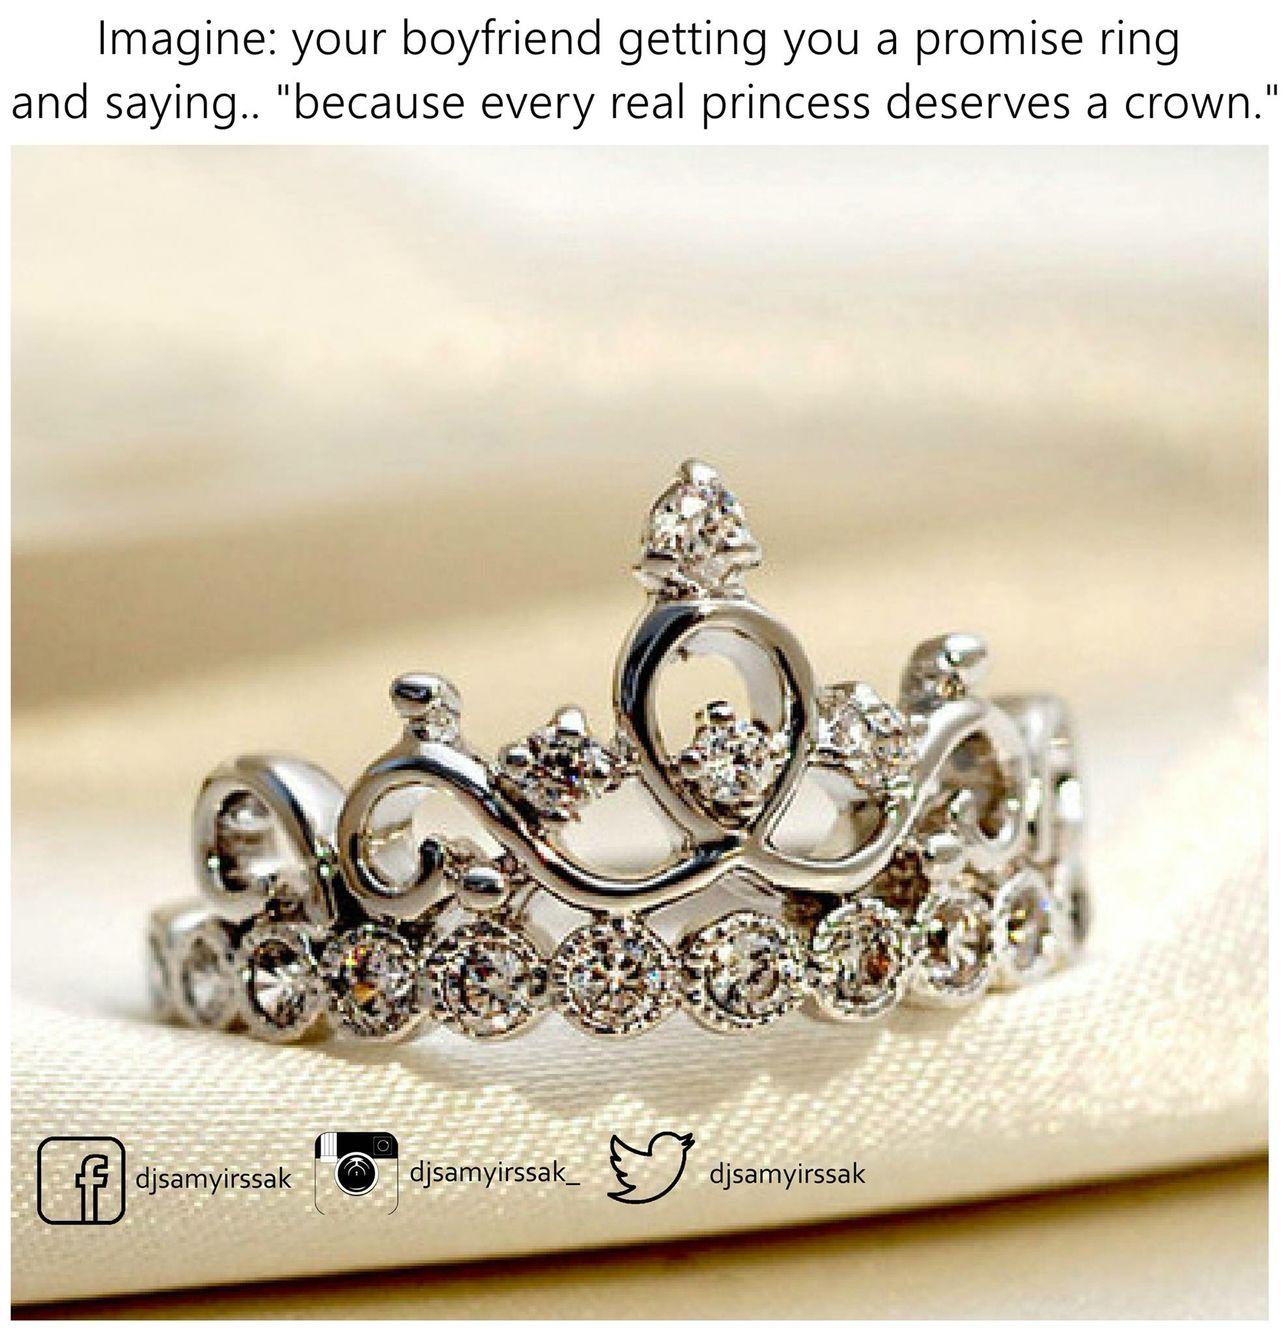 Every princess deserves a crown | Love | Pinterest